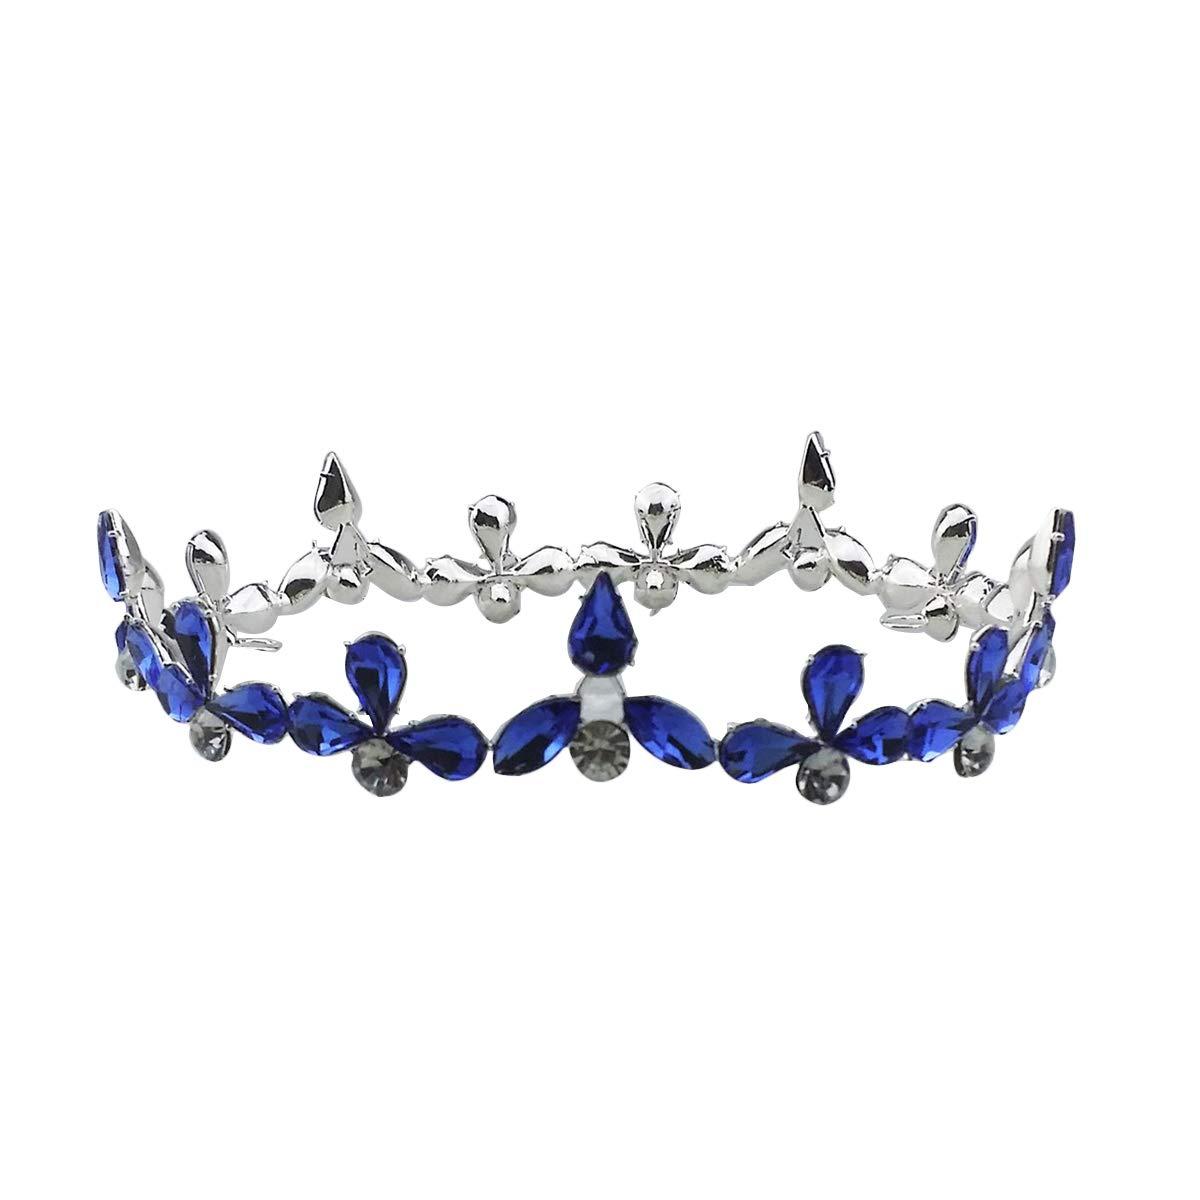 TINKSKY Baroque Bridal Crown Tiara Crystal Bride Round Headband Wedding Tiara Full Crown Wedding Accessories (Silver)